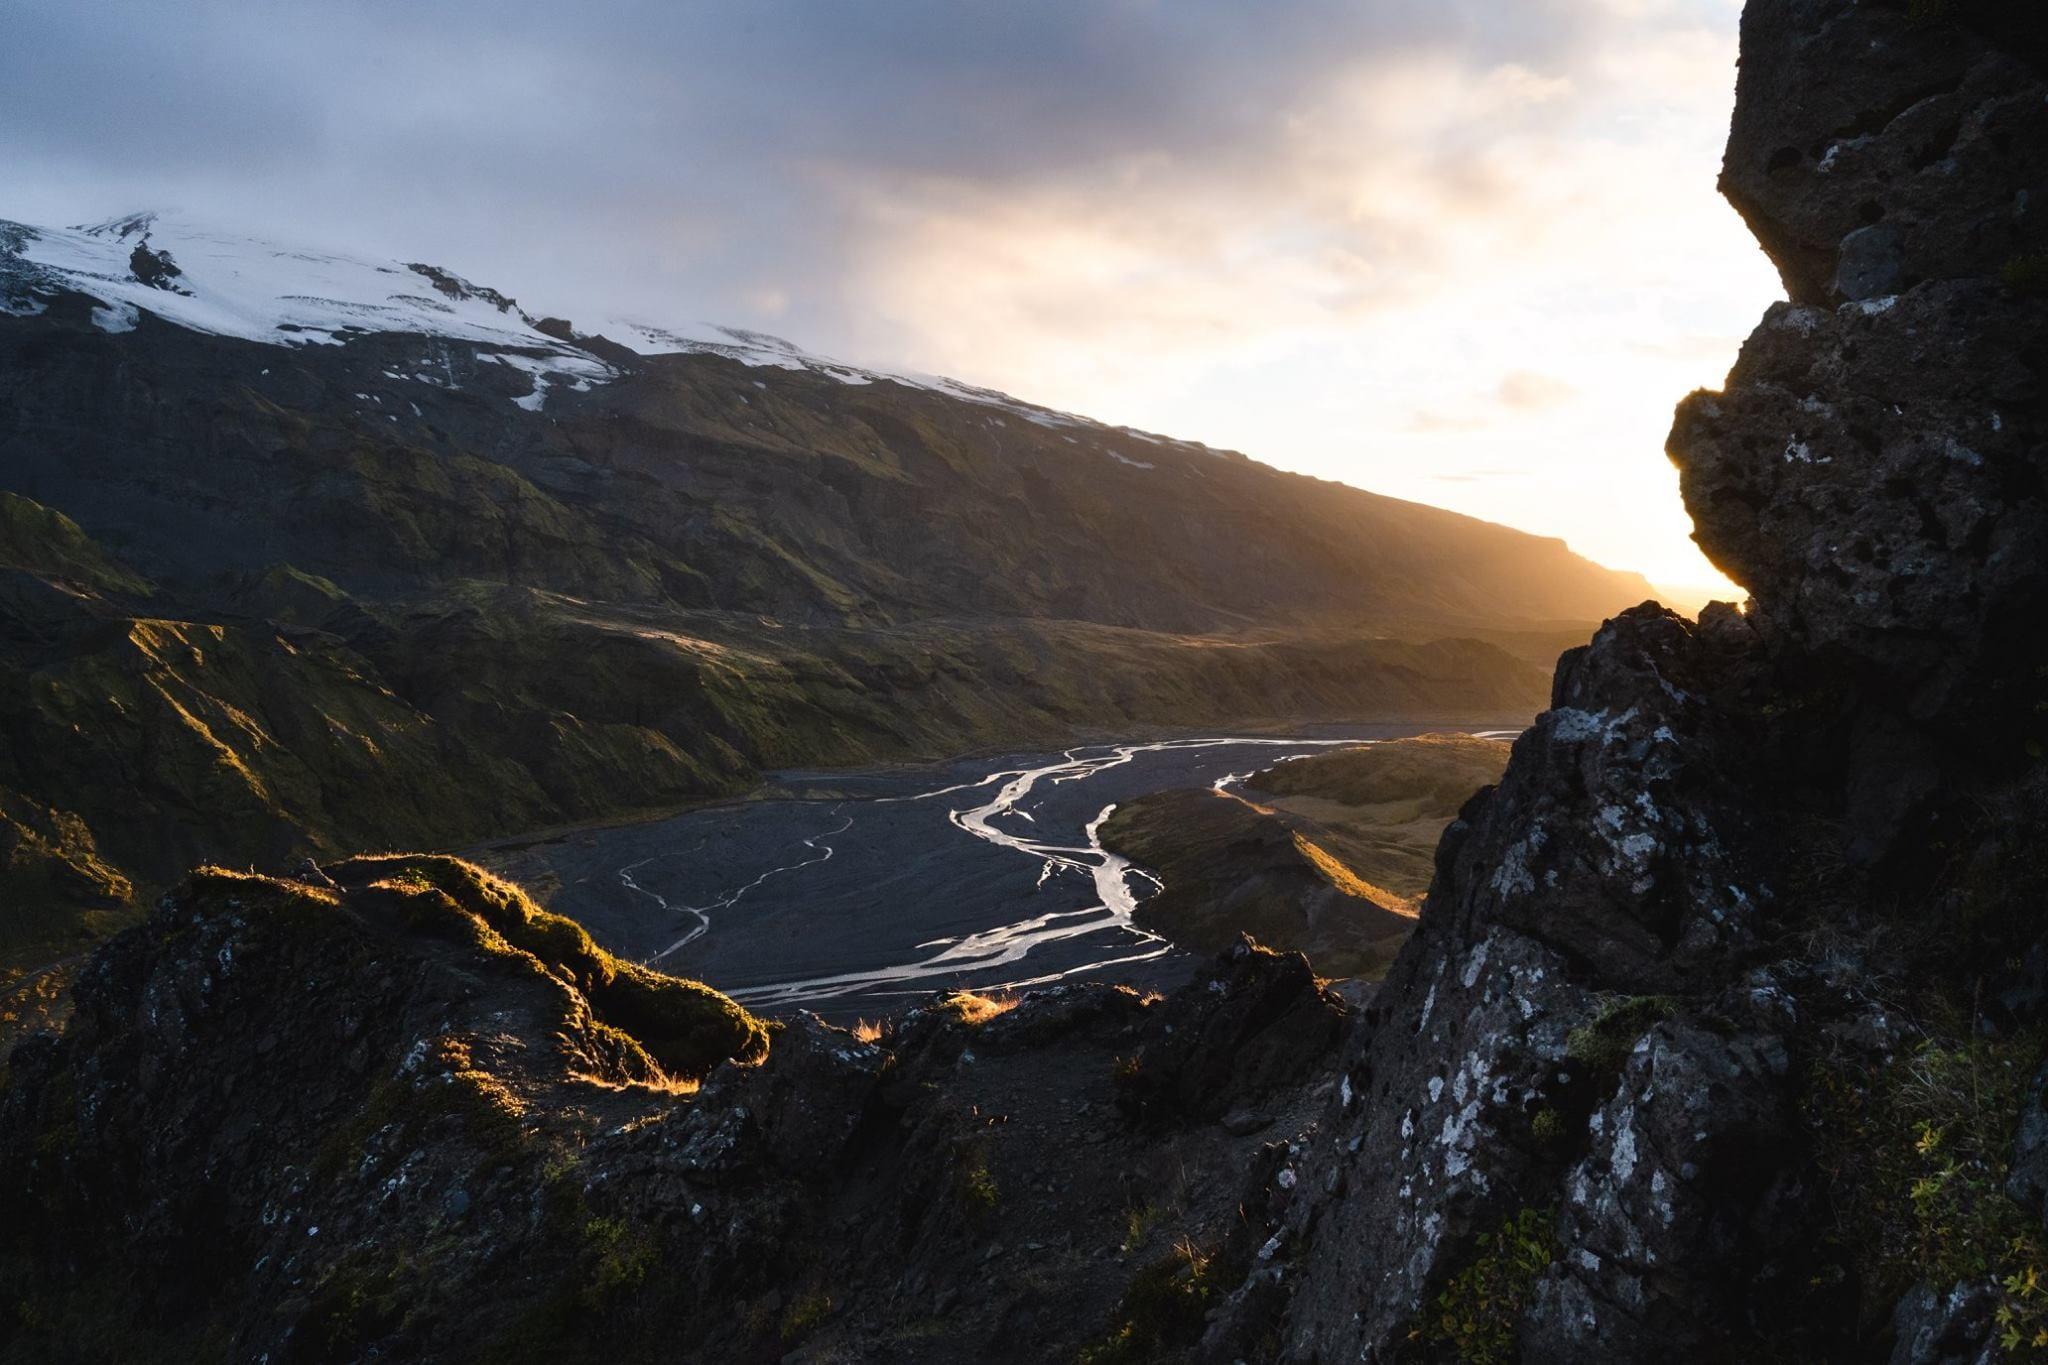 fotografie avontuur IJsland Chris Konig foto (6)